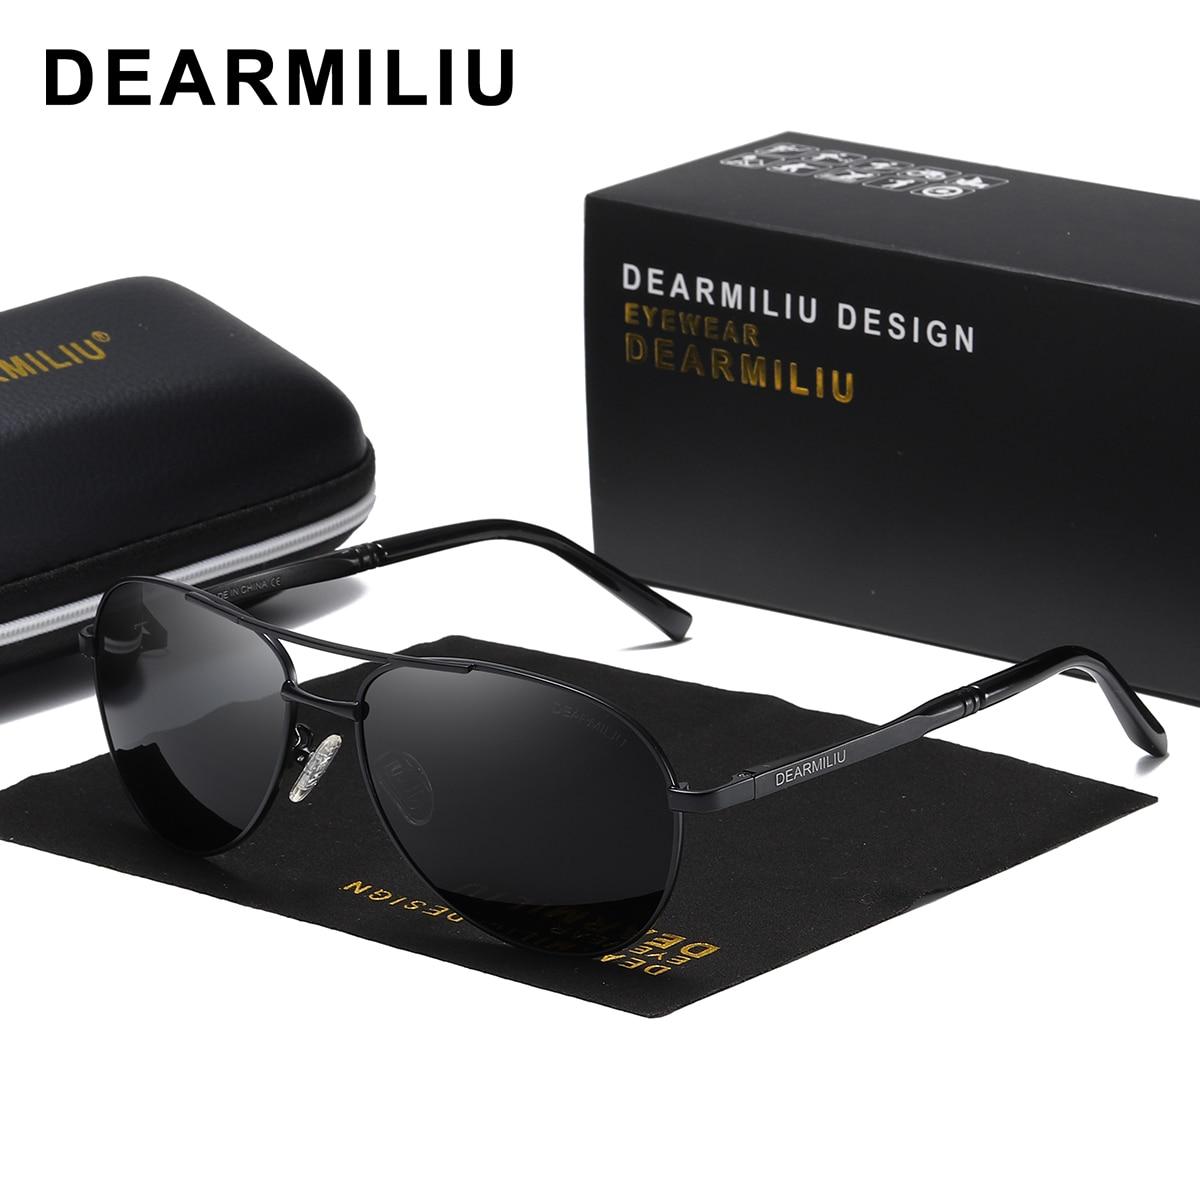 DEARMILIU Men's Sunglasses Brand Designer Pilot Polarized Male Sun Glasses Eyeglasses gafas oculos de sol masculino For Men 1306